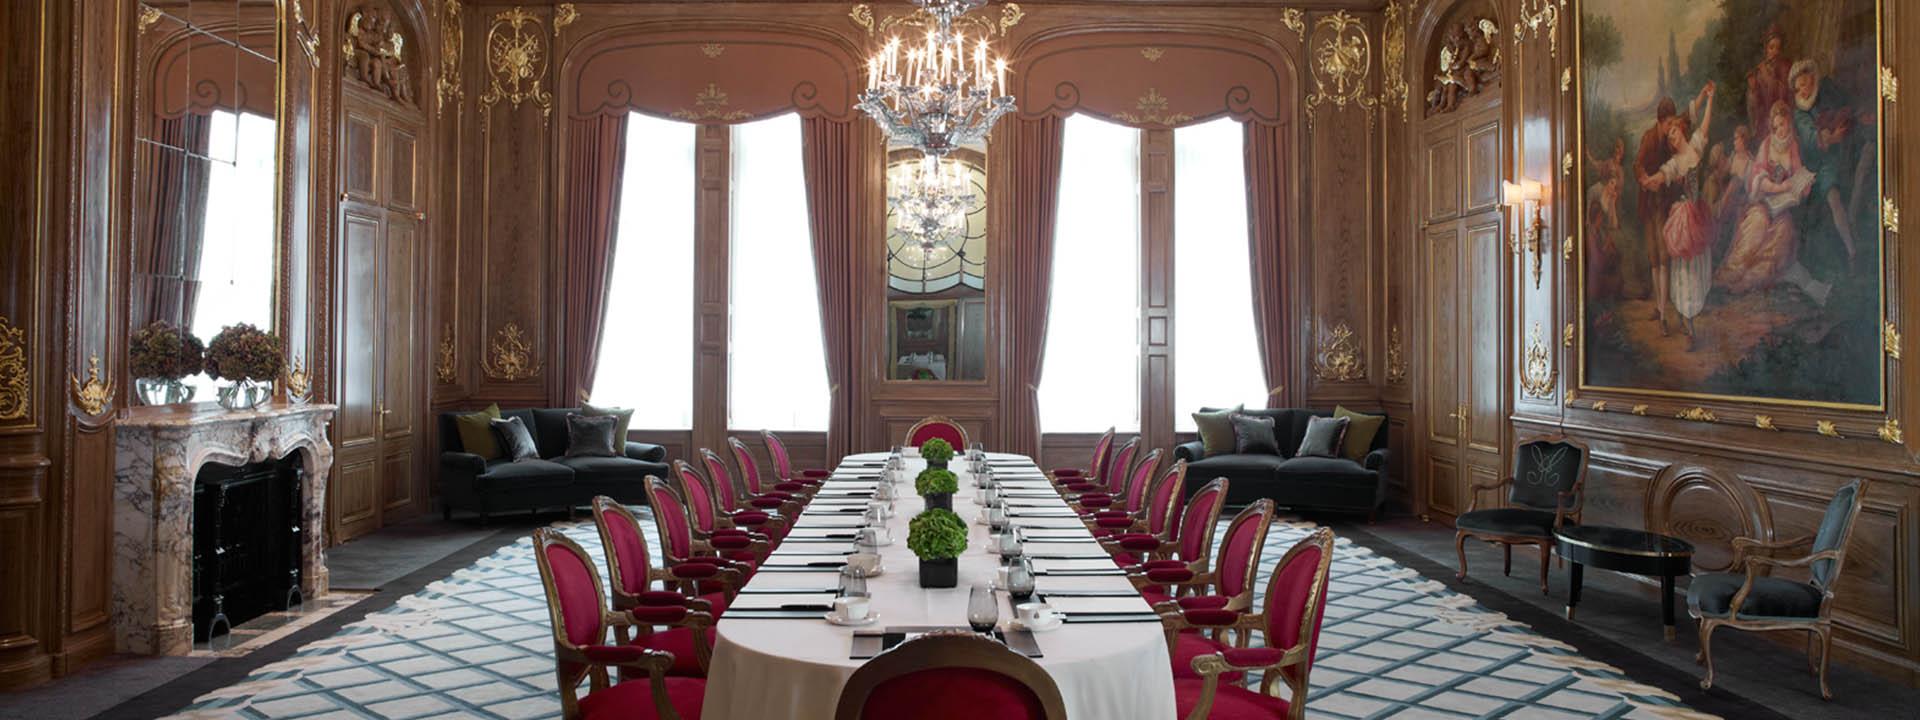 Claridge's business meeting room